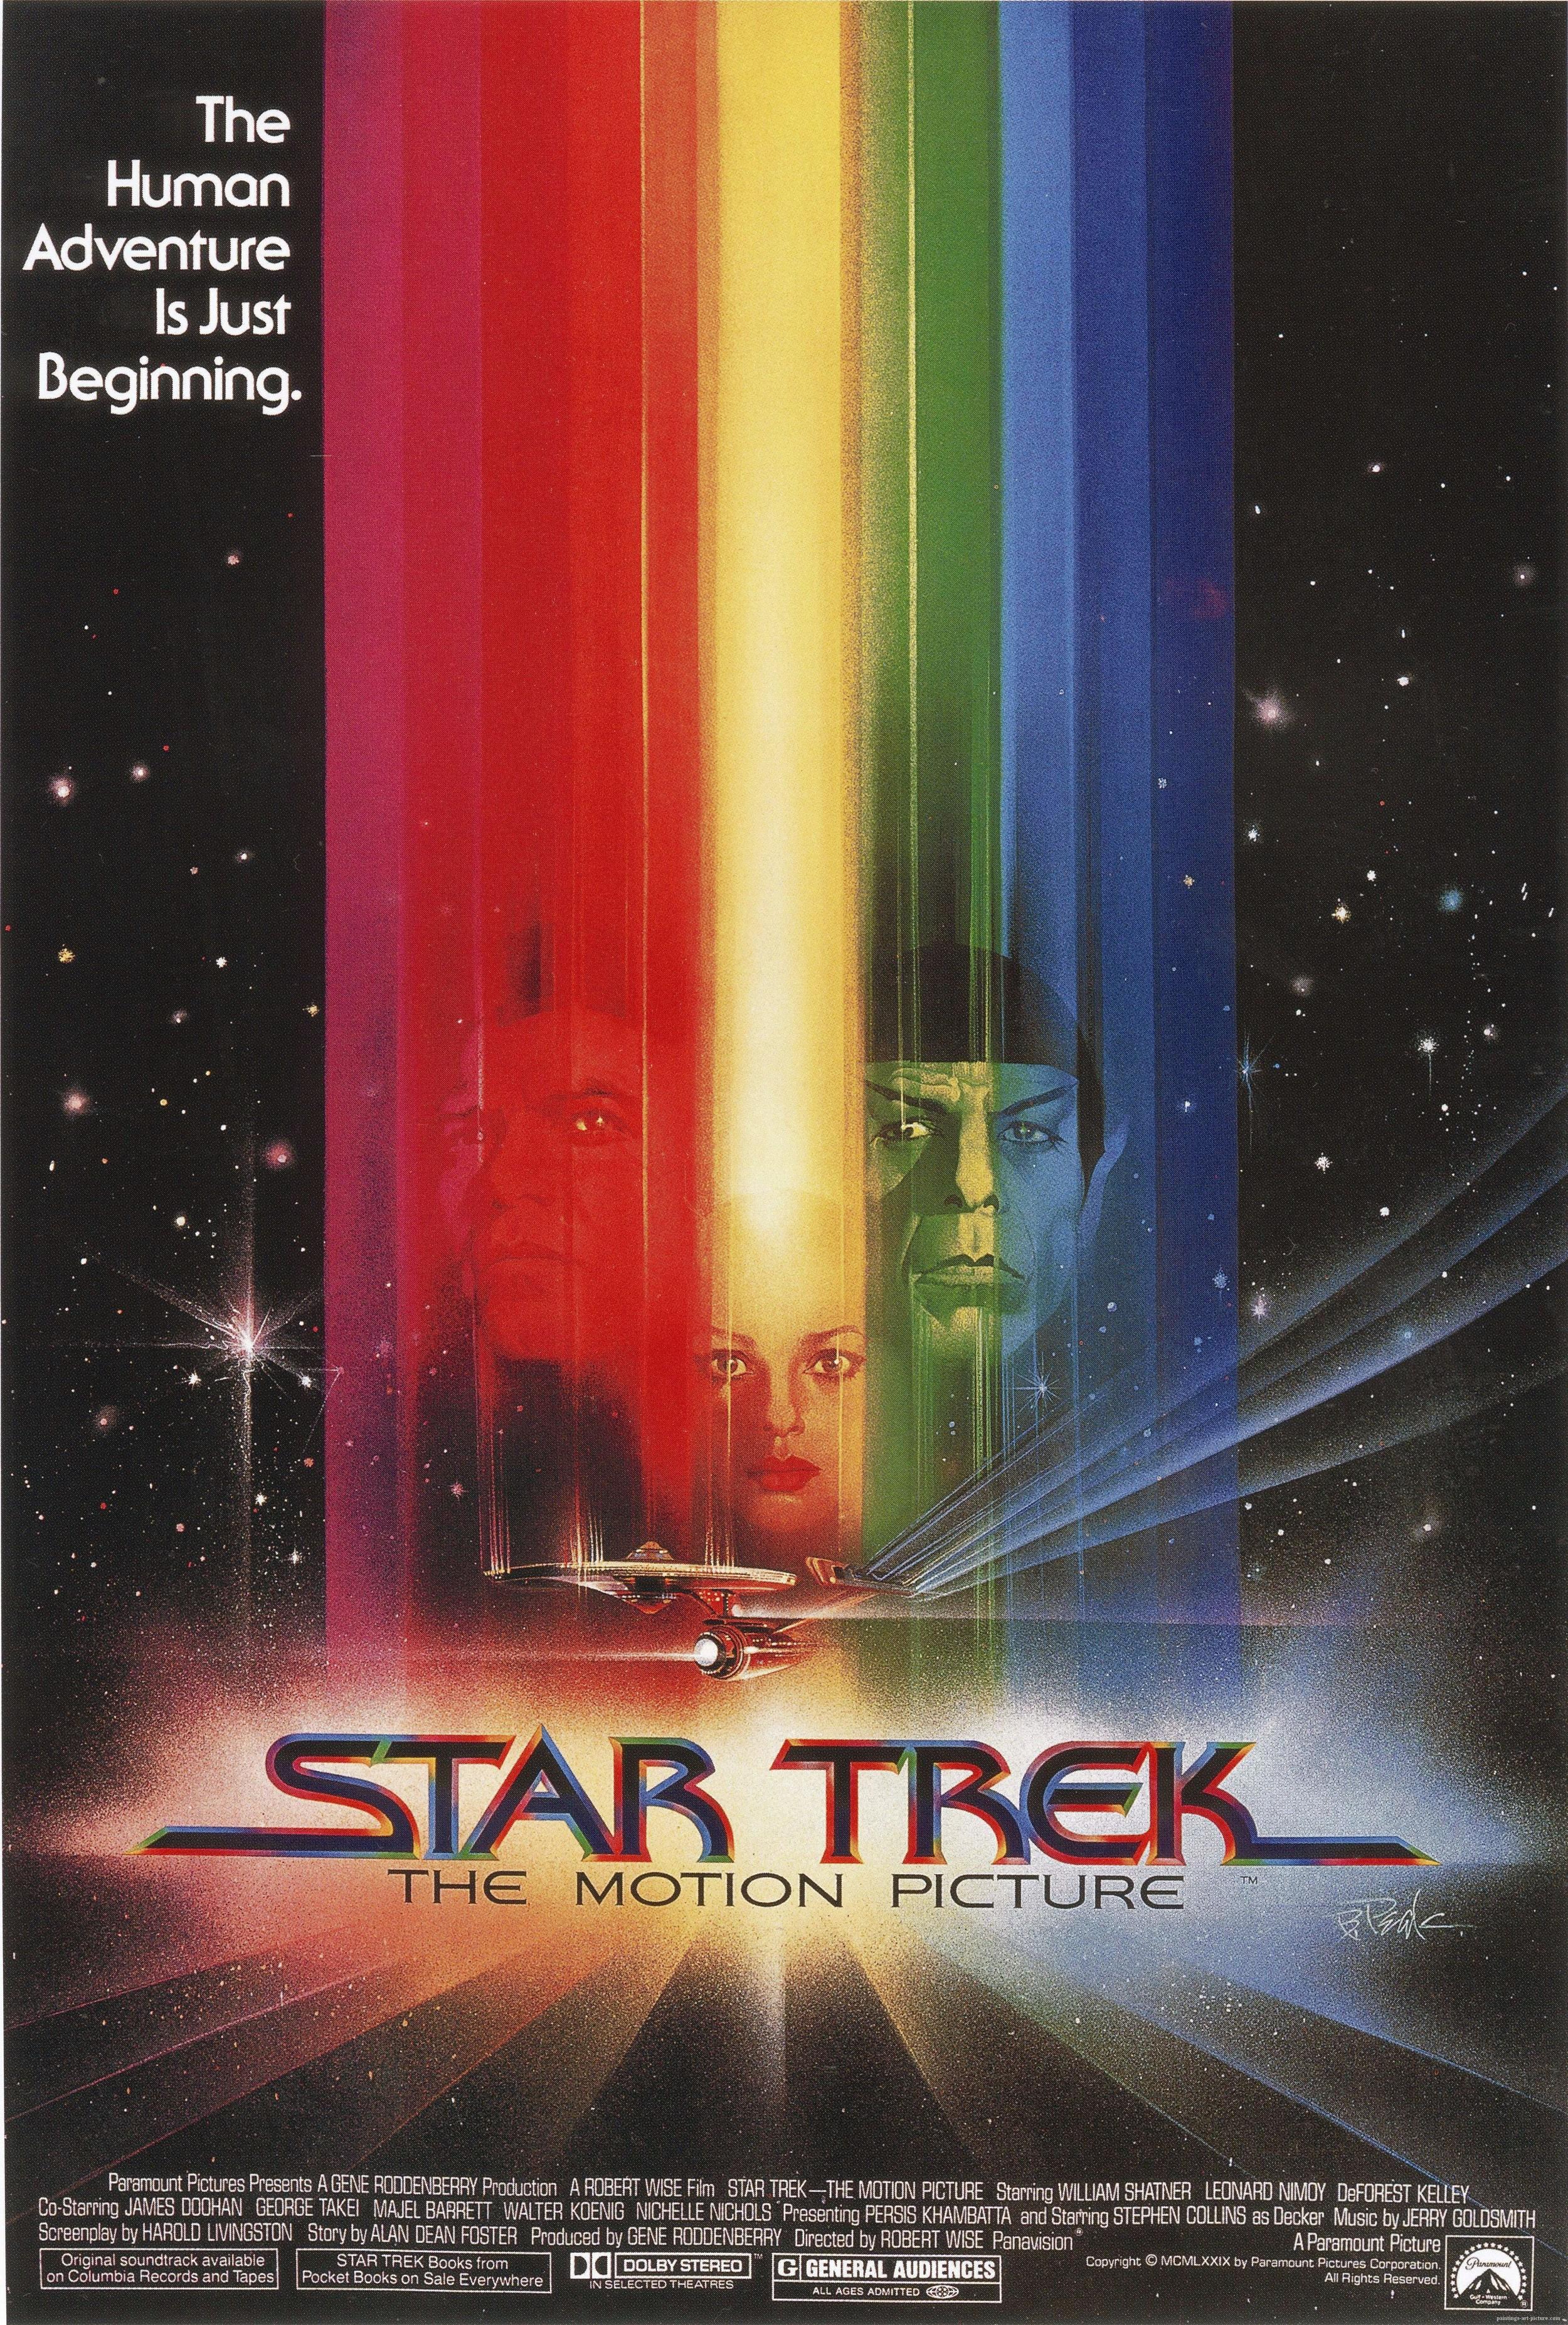 Star Trek The Motion Picture 1979 Movie-Poster.jpg